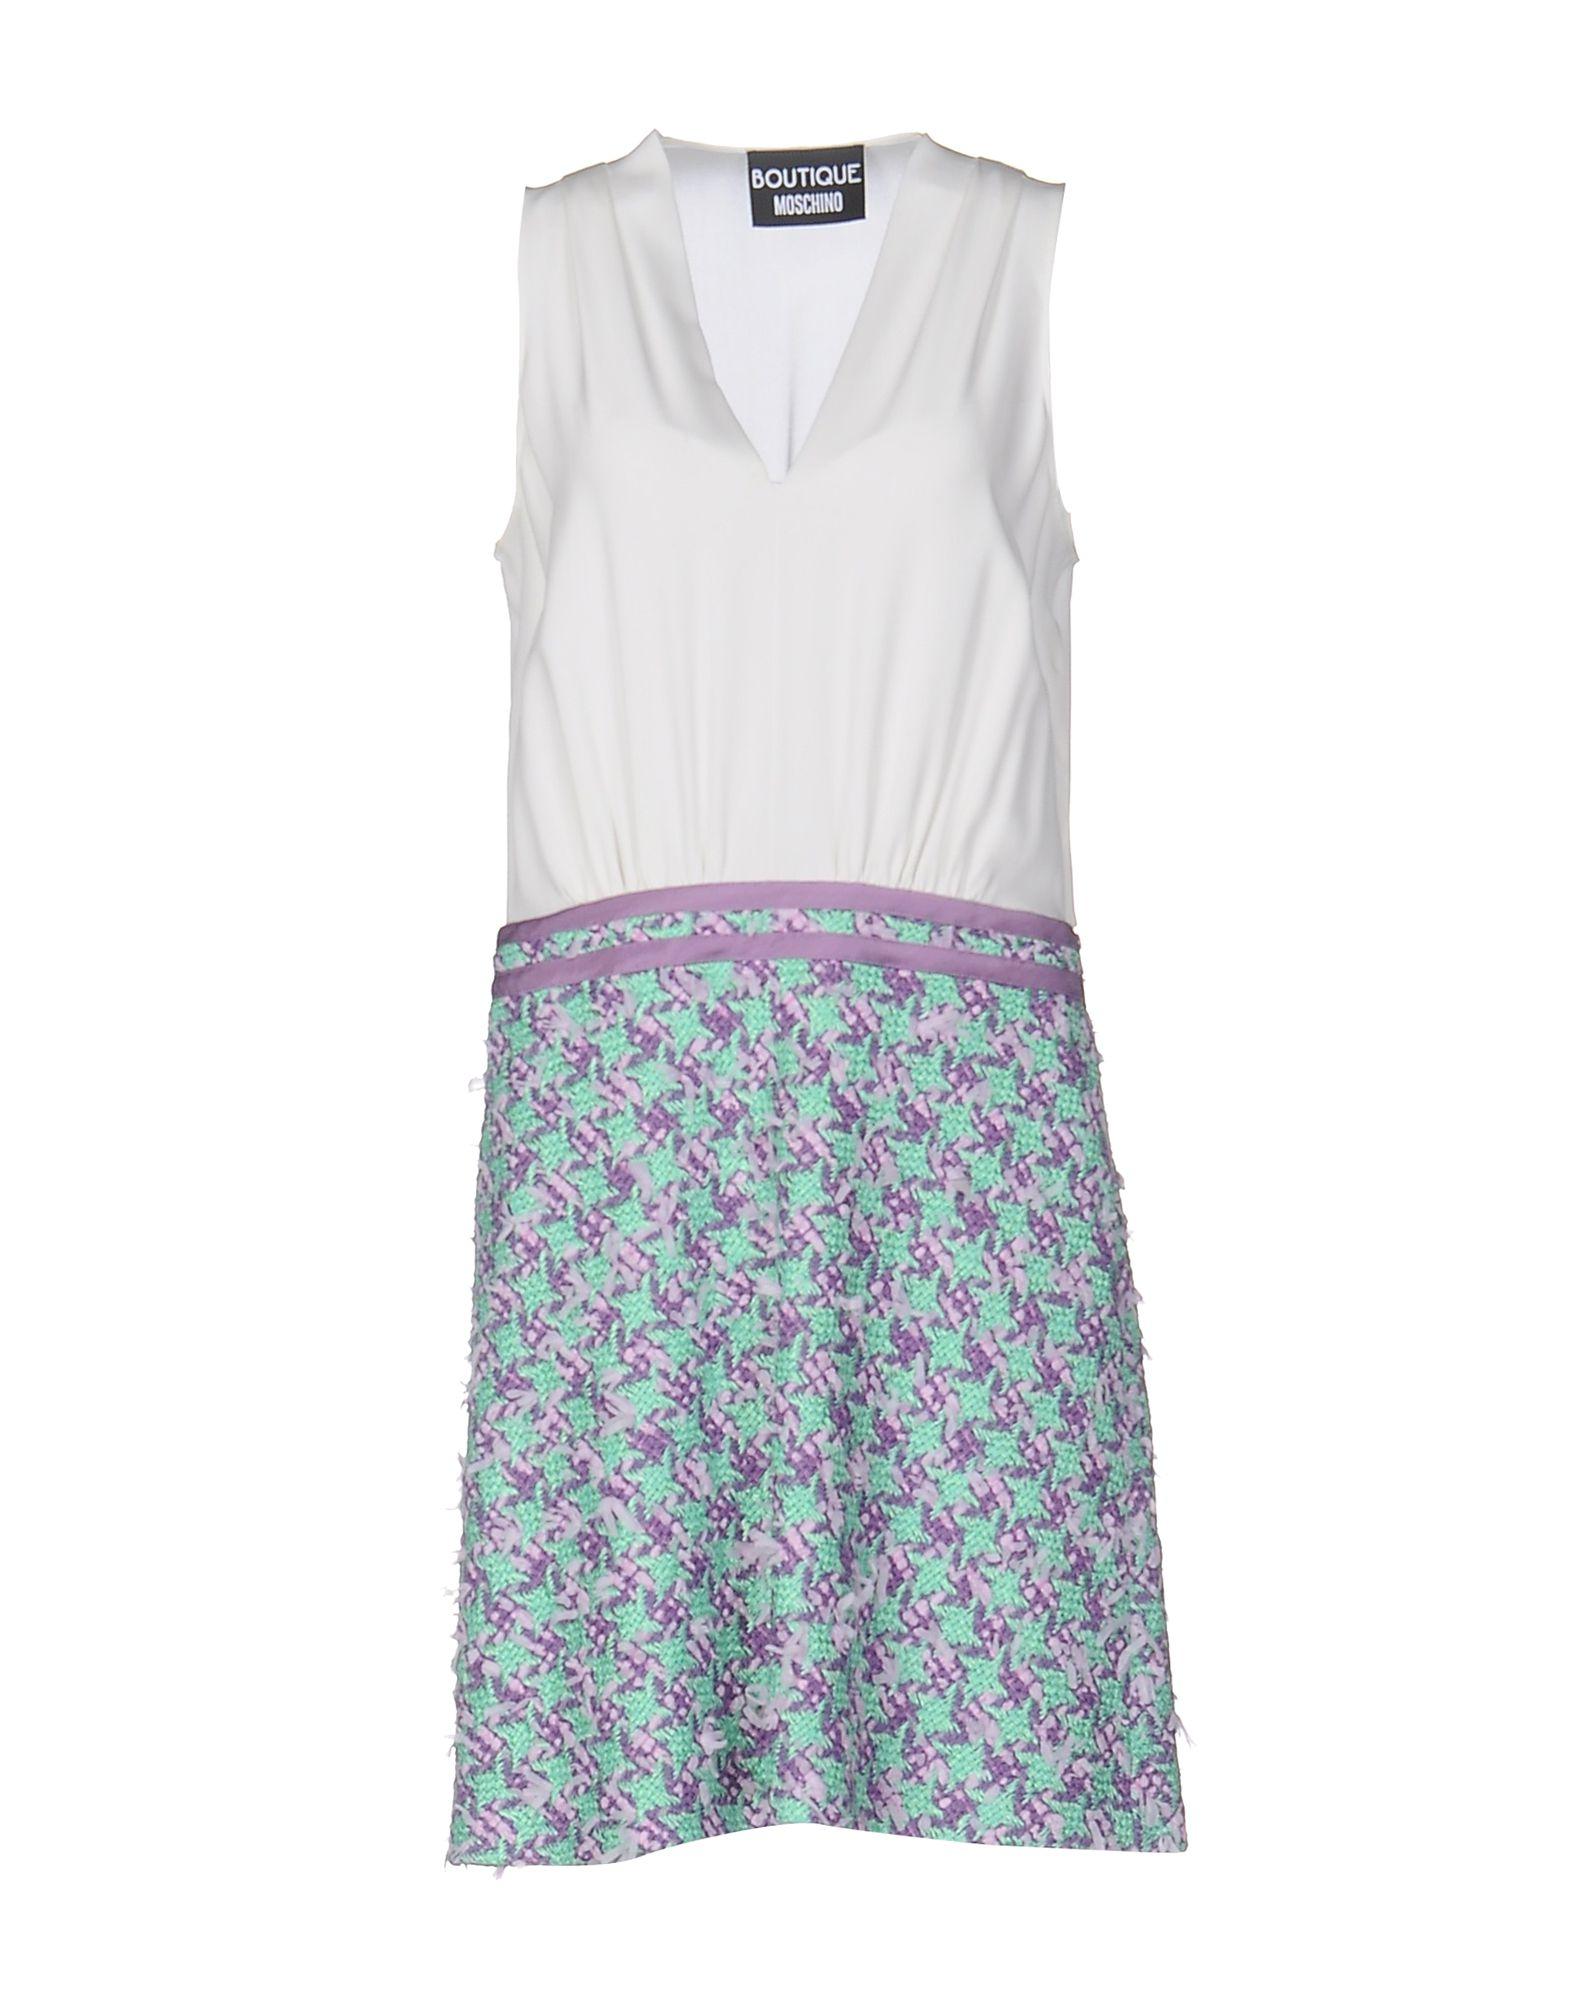 ФОТО boutique moschino короткое платье